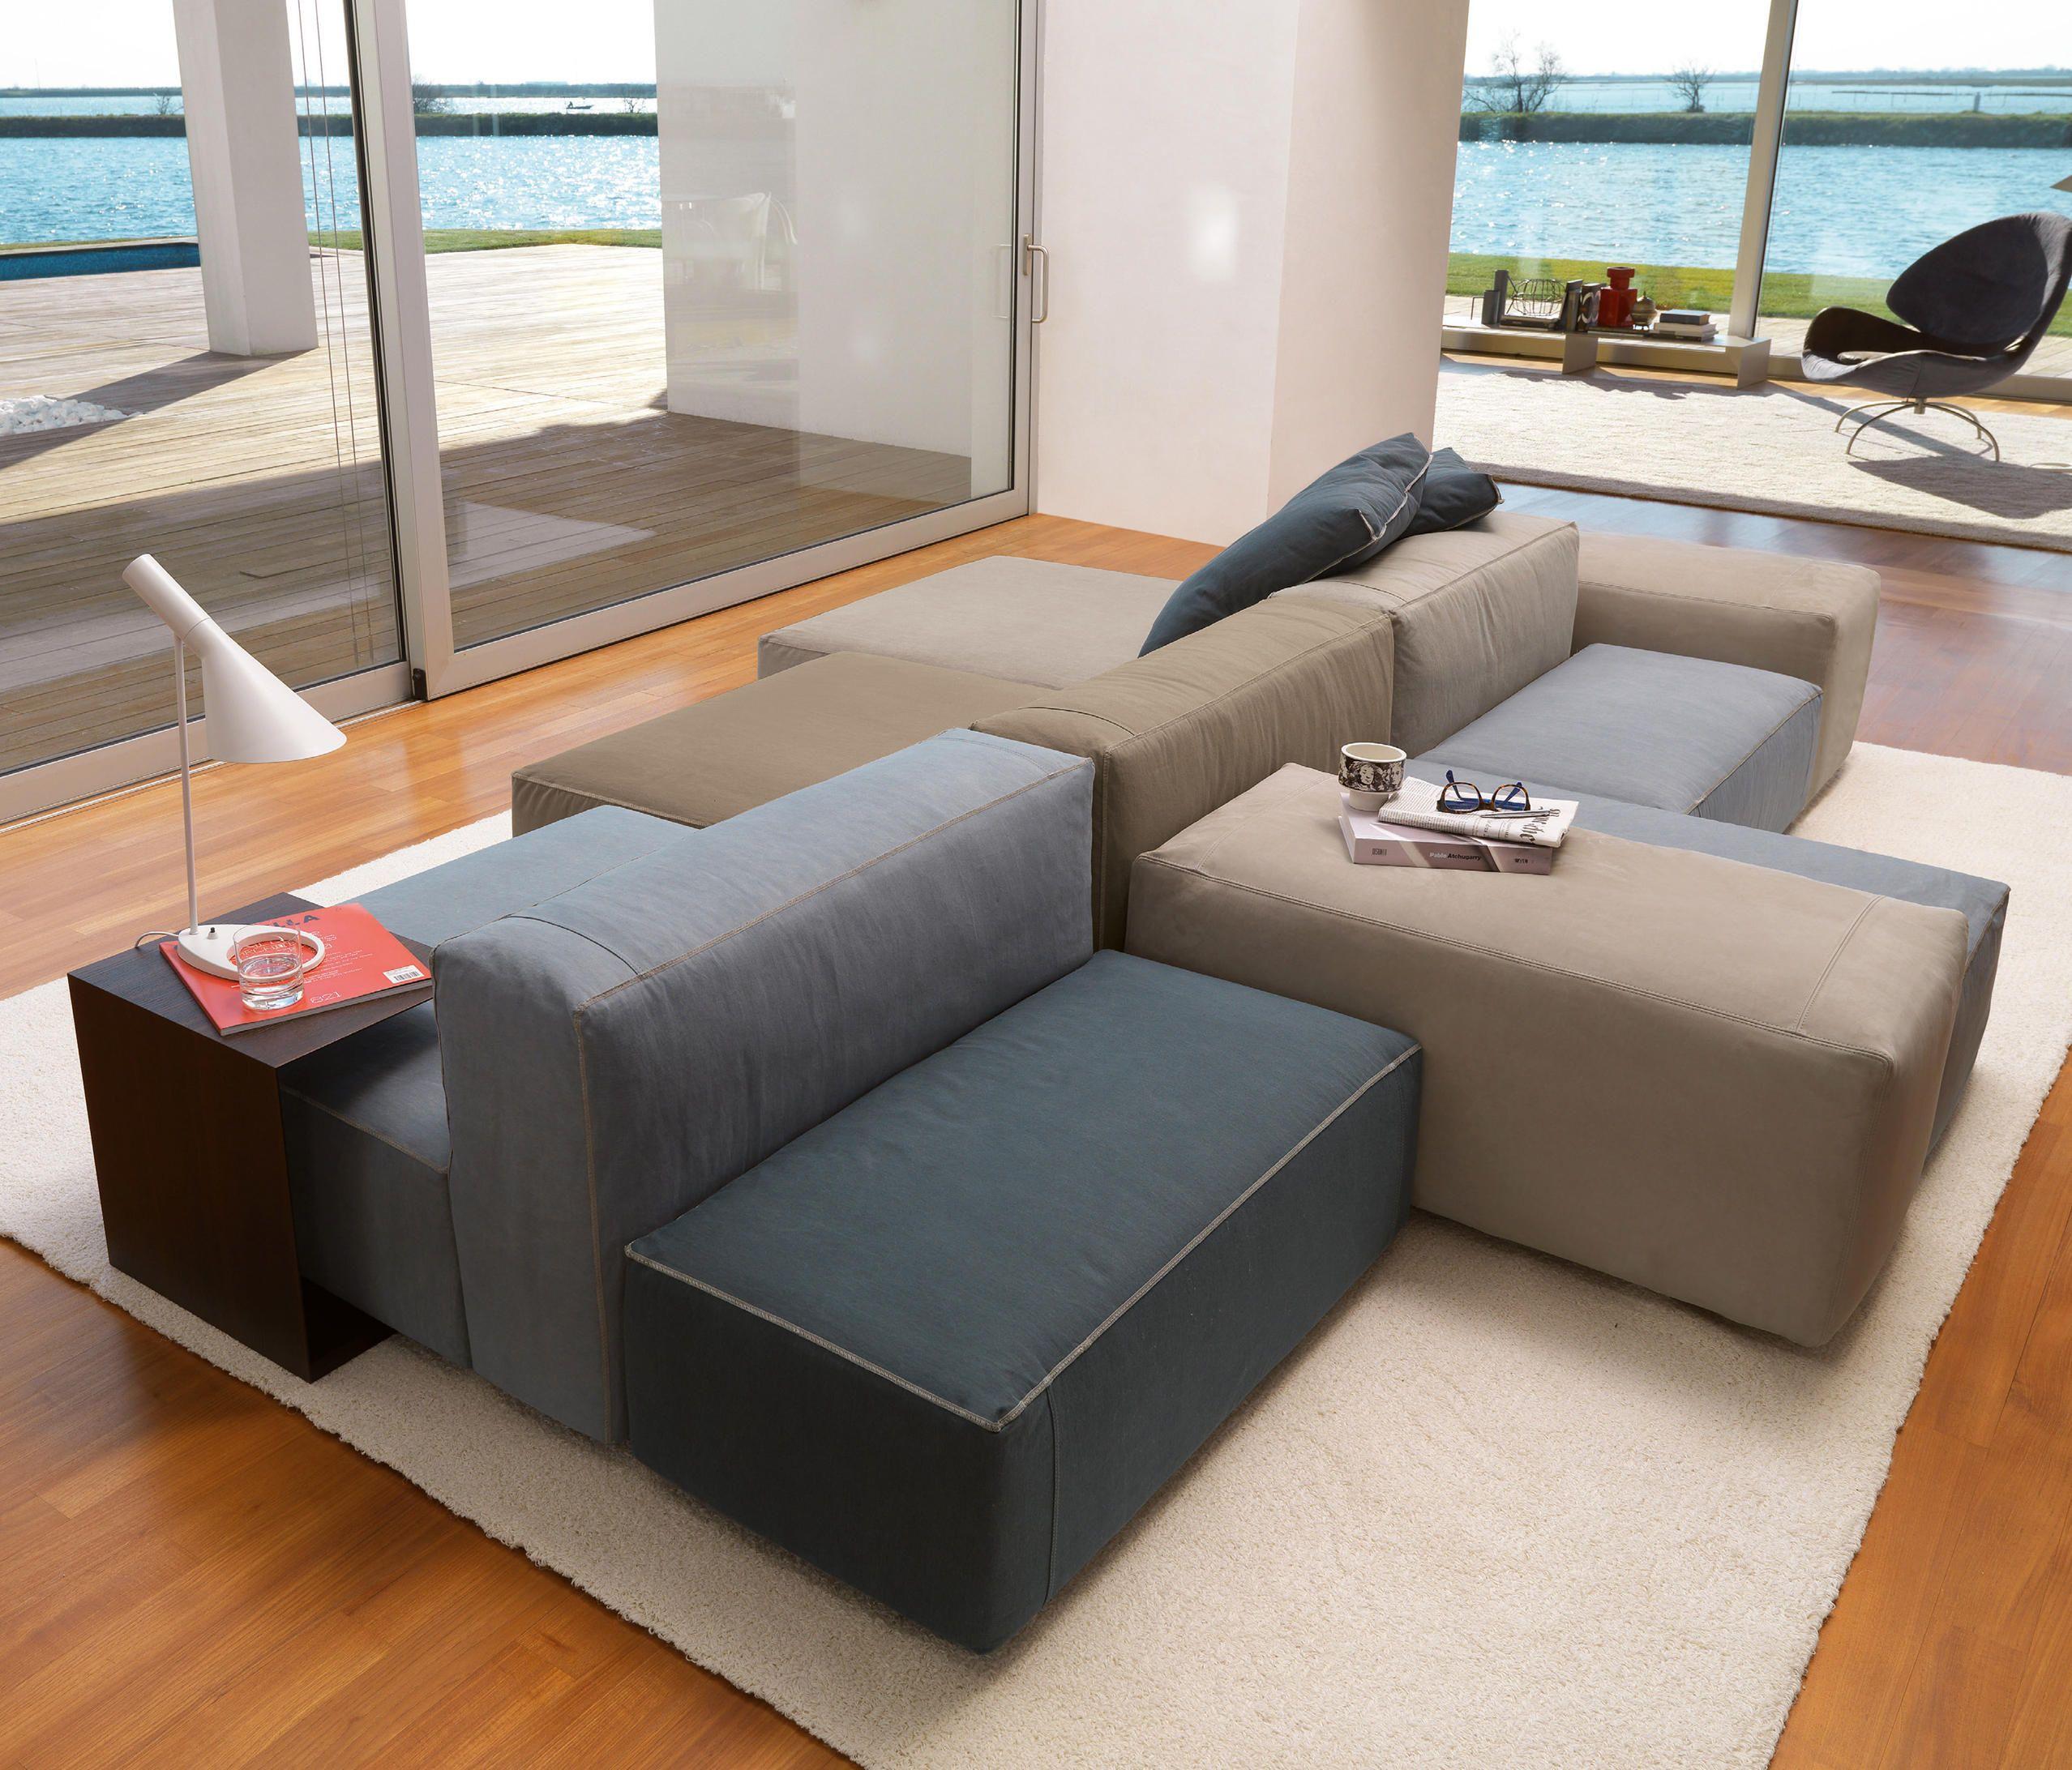 Blo Us By Desiree Modular Sofa Systems Small Living Room Decor Sofa Design Furniture